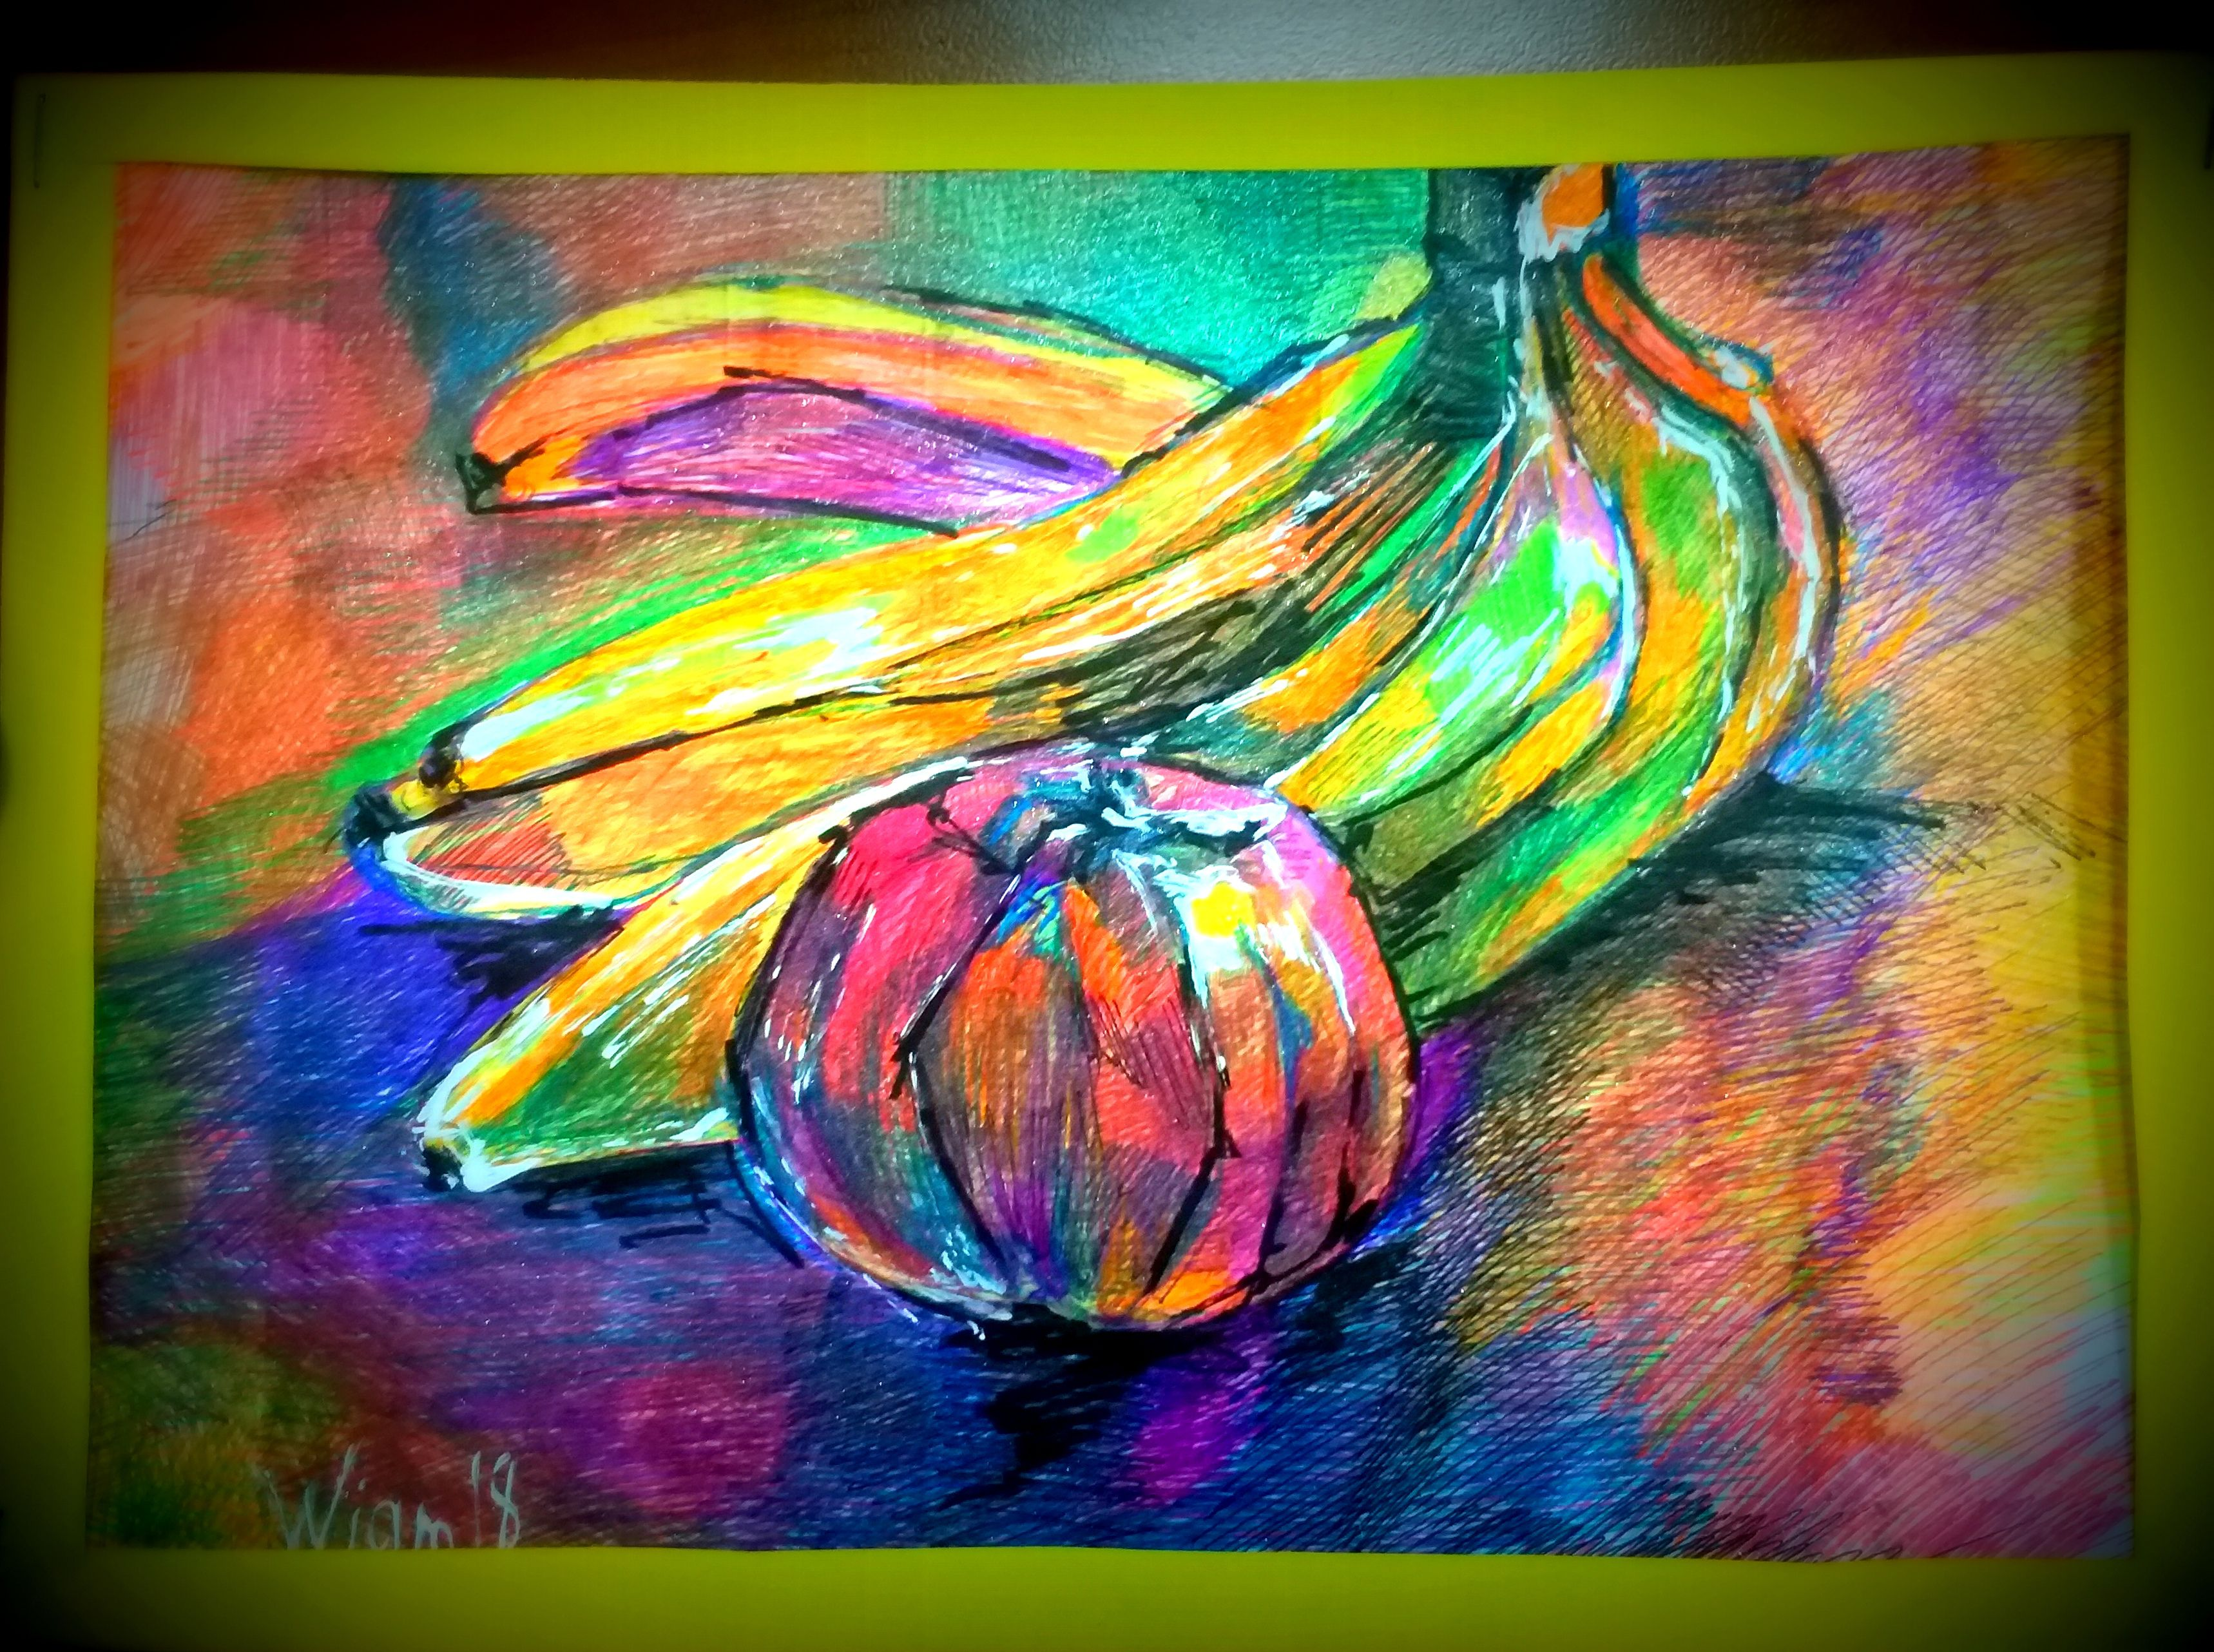 бананы картина ручки рисунок гранат фрукты натюрморт гелевые